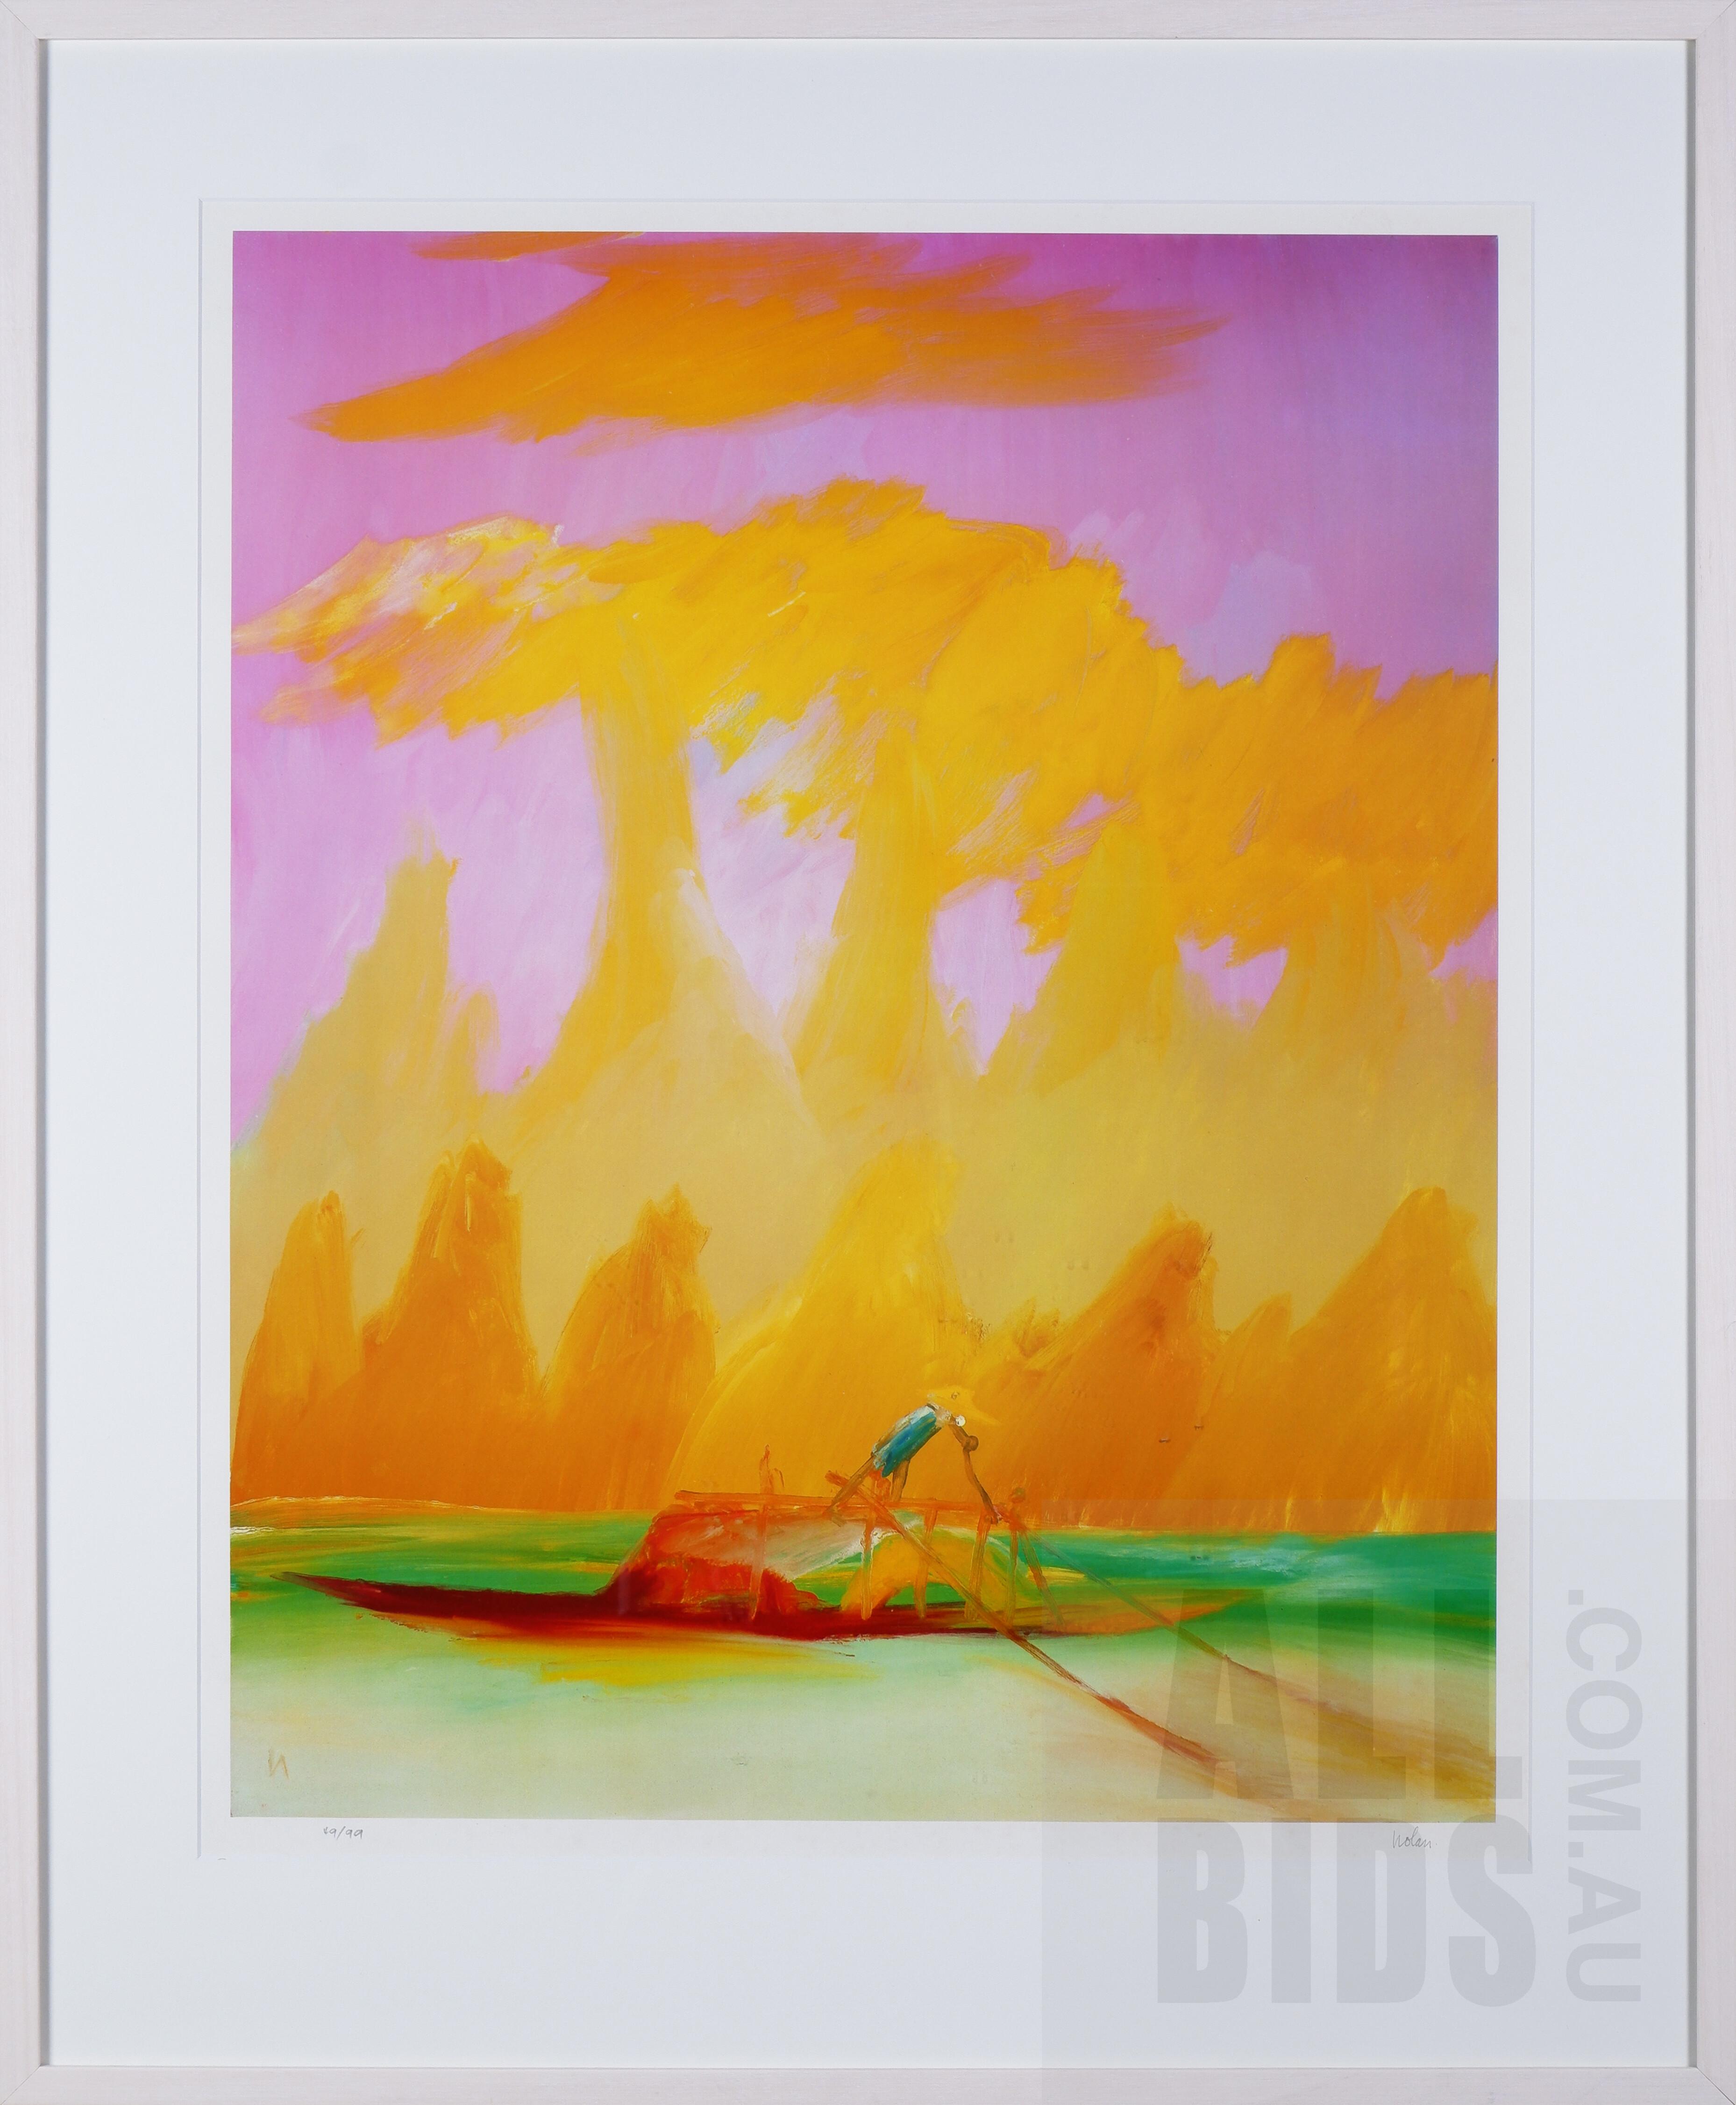 'Sidney Nolan (1917-1992), River Kwai Series, Photolithograph, 72 x 57 cm (image size)'